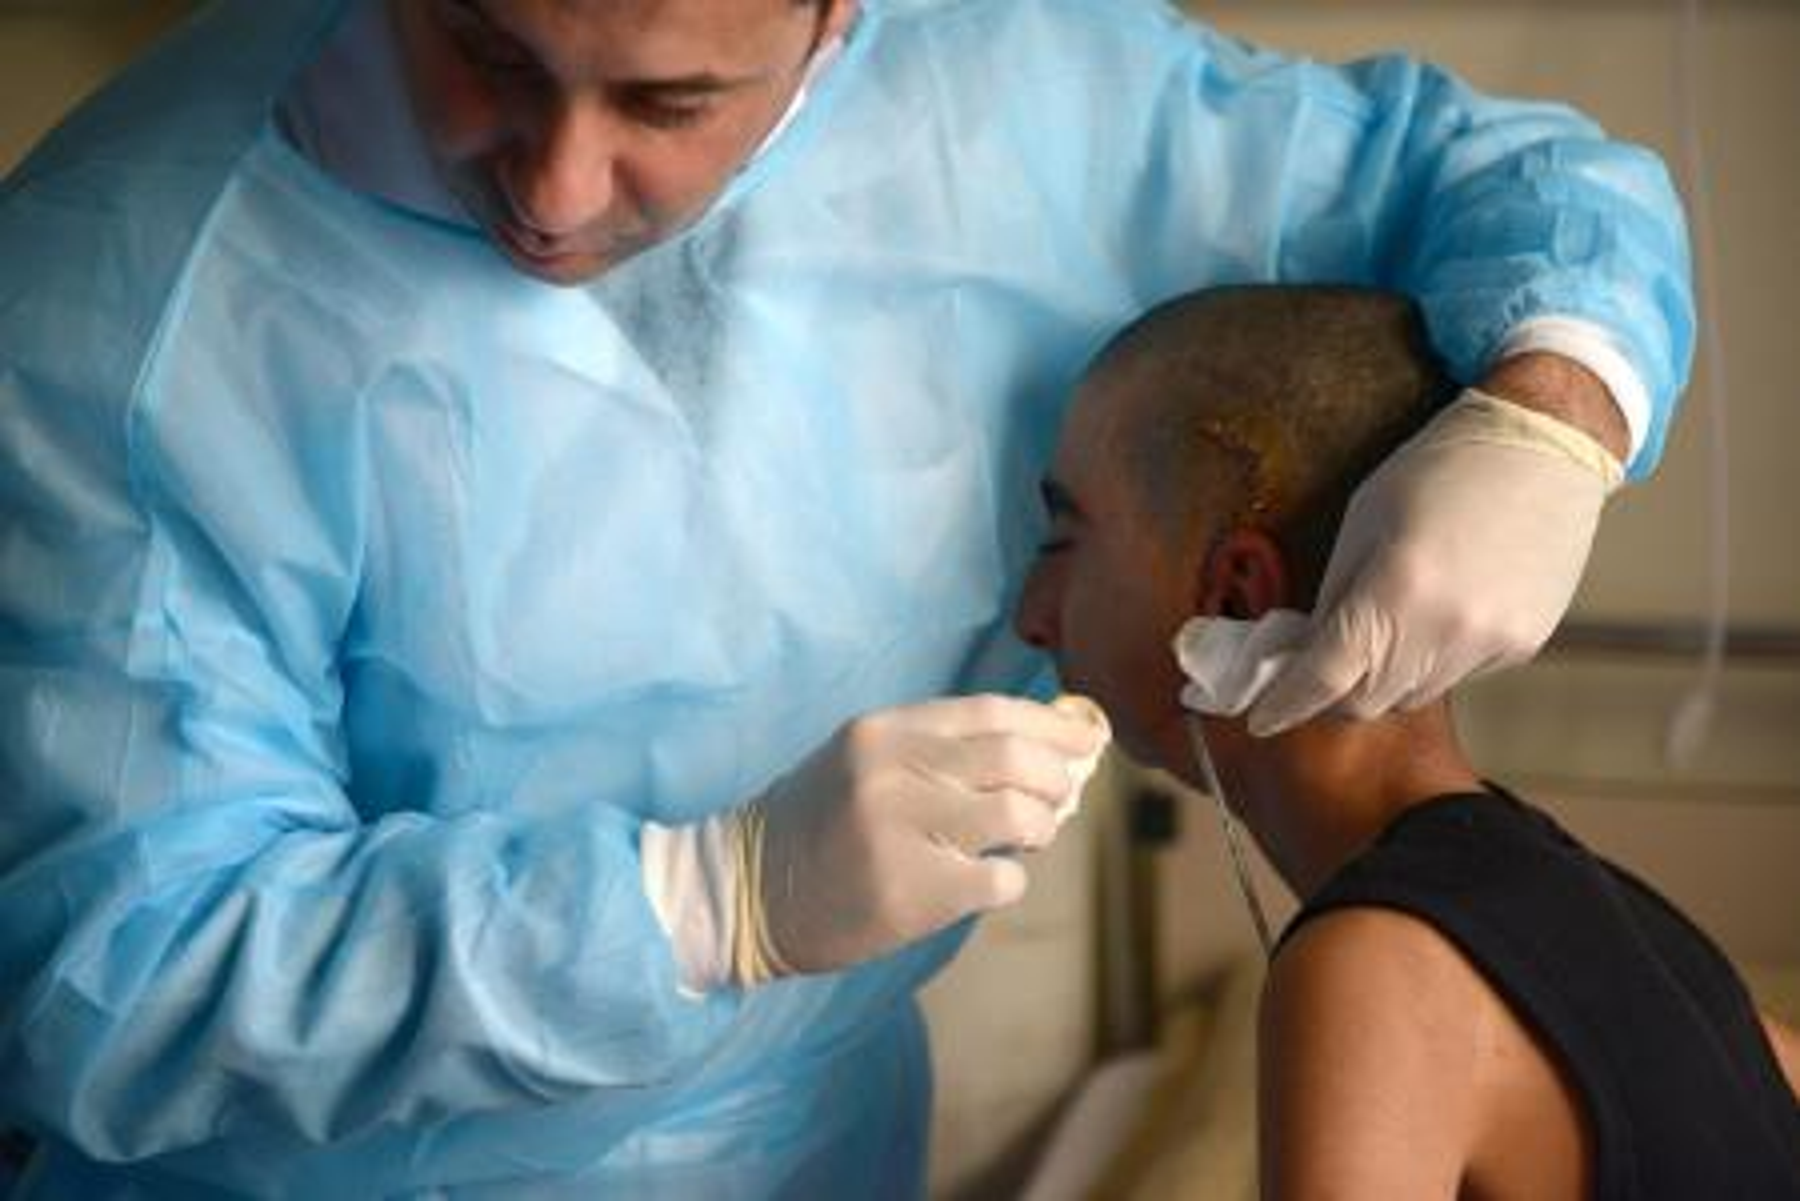 Surgeon and Iraqi boy with jaw injury